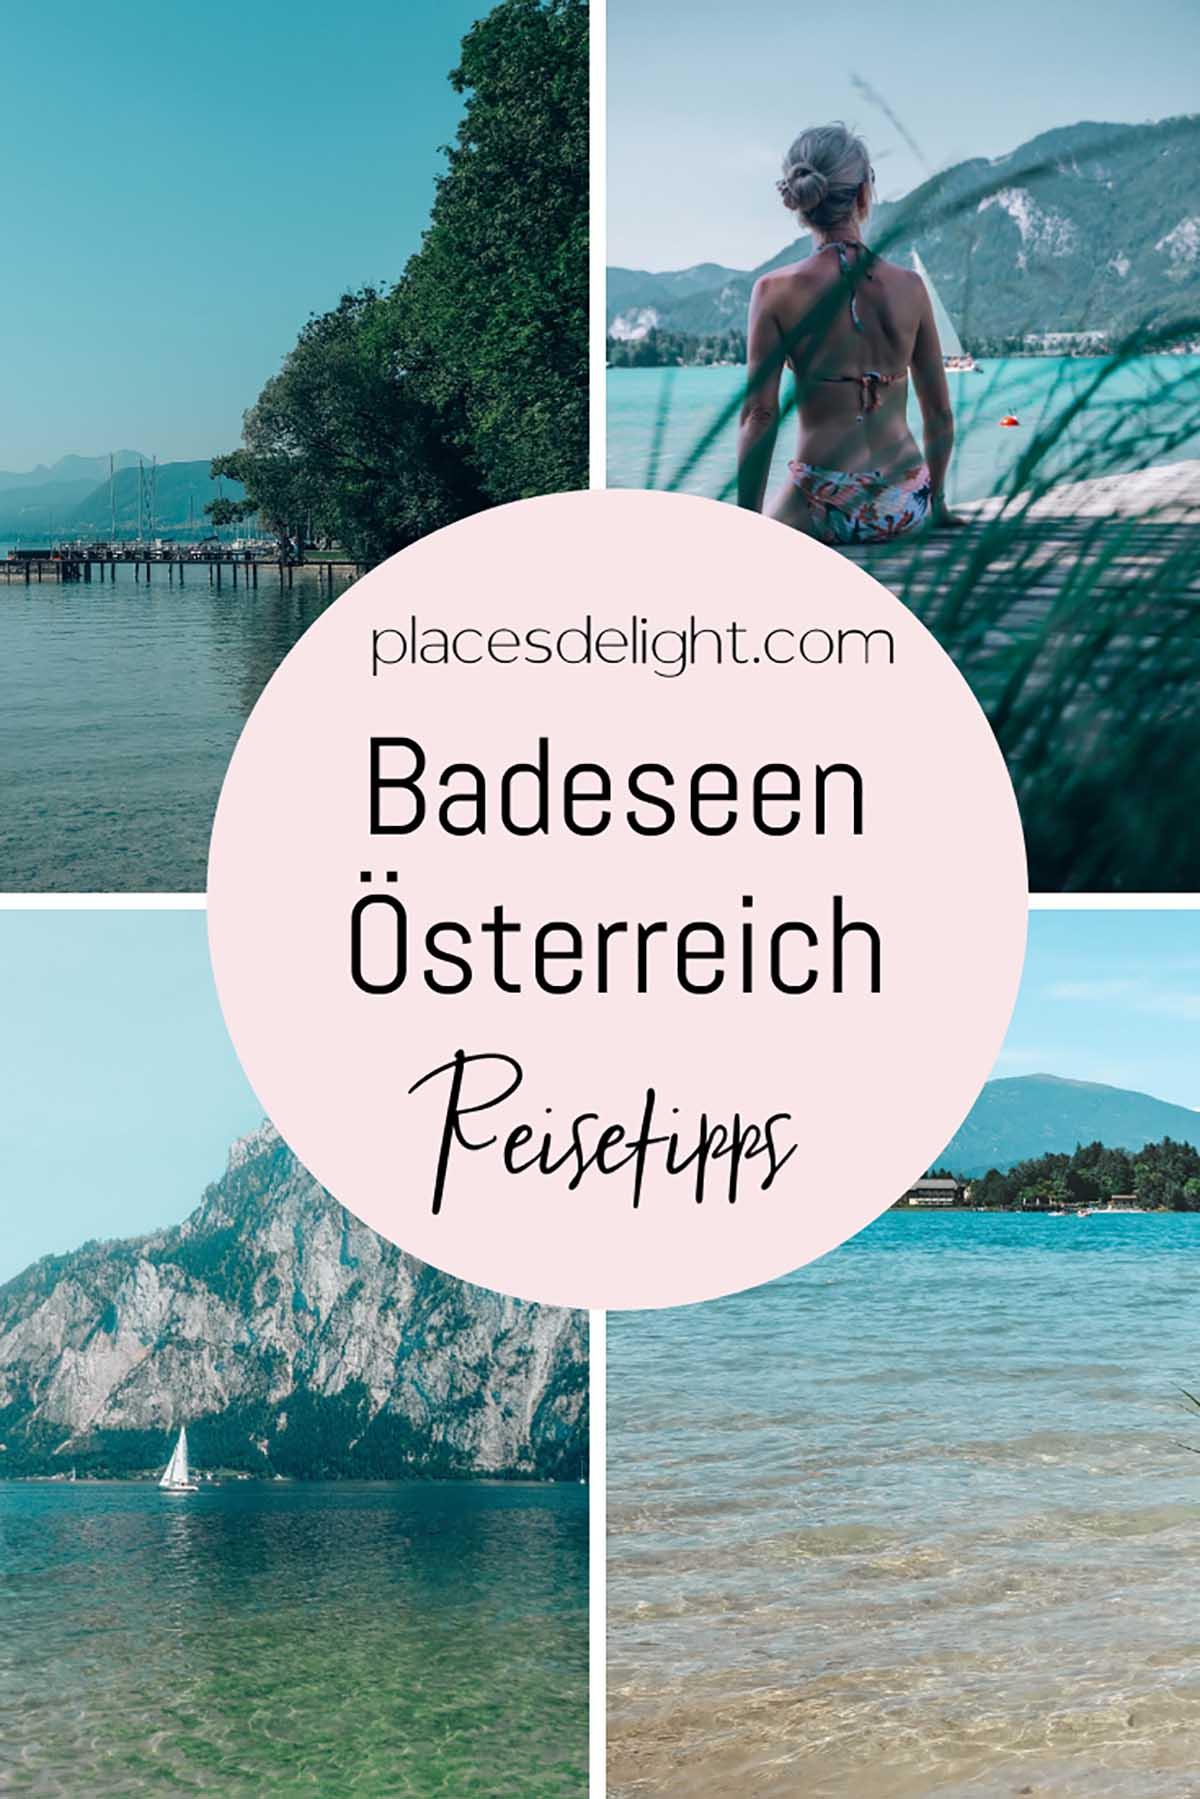 placesdelight-bade-seen-oesterreich-reise-tipps